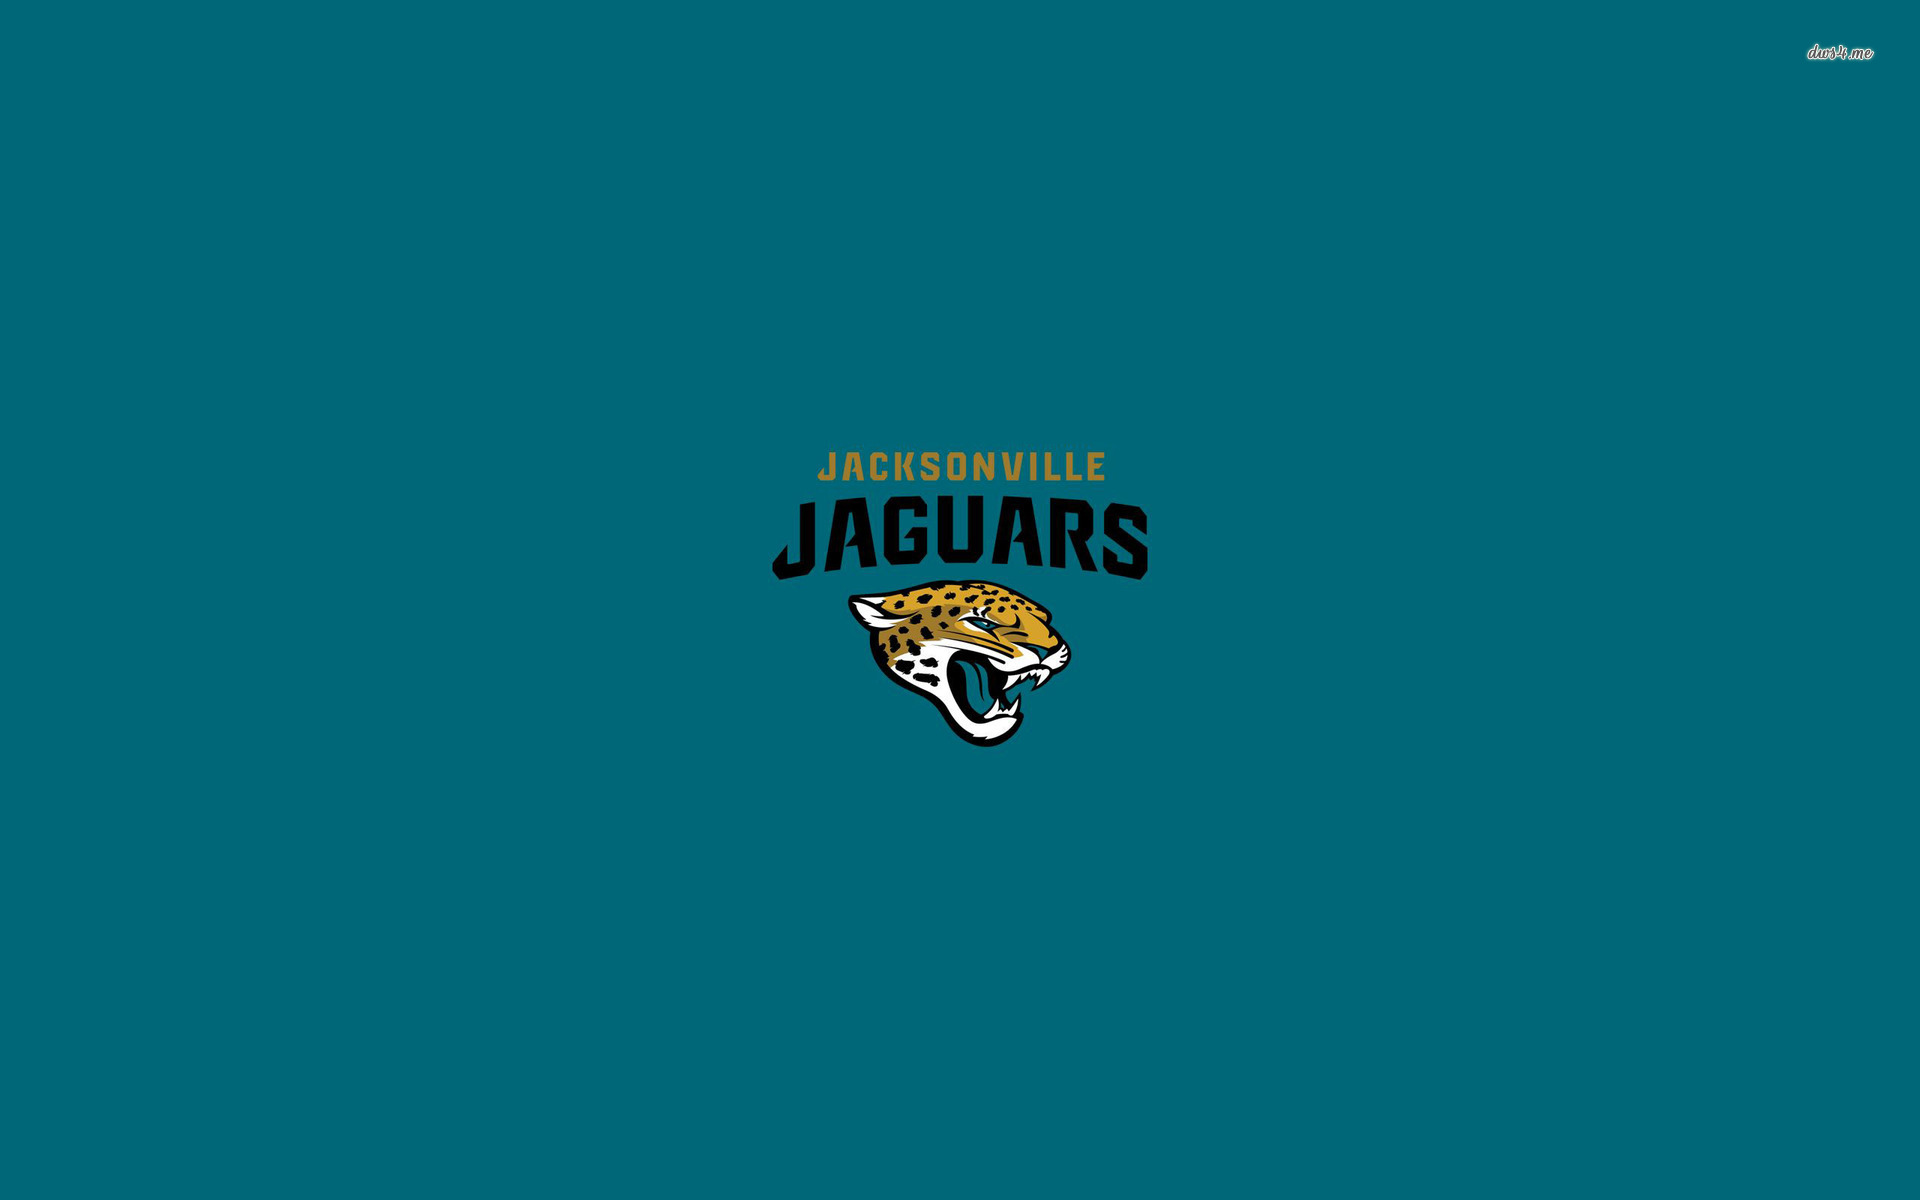 Jacksonville Jaguars wallpaper   Sport wallpapers   24628 1920x1200